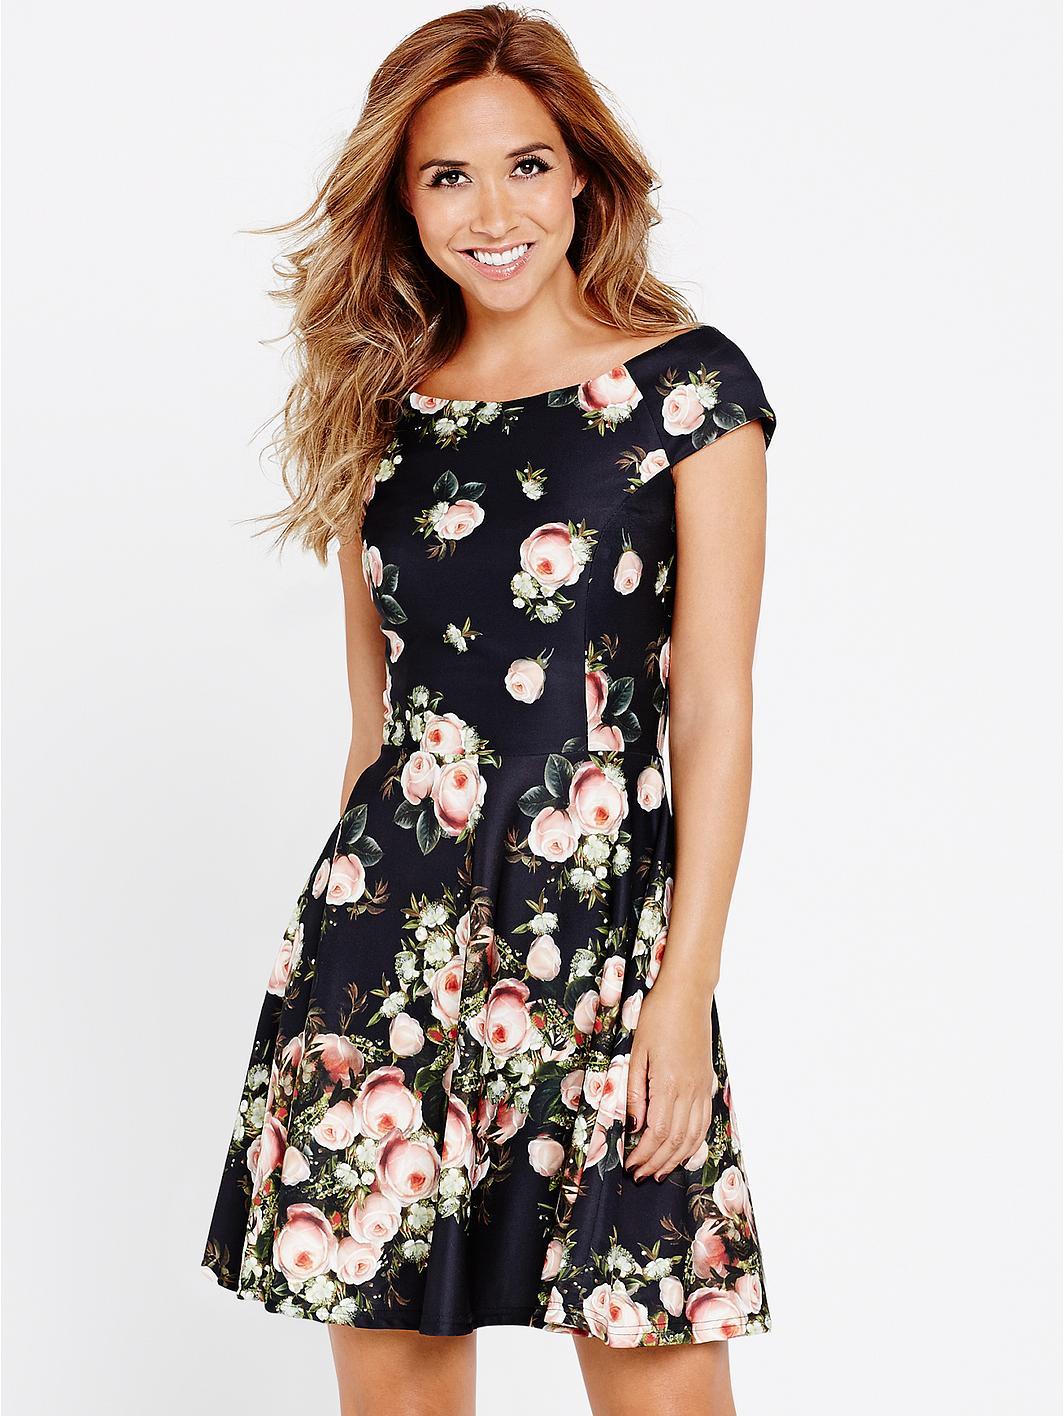 e53586c1e7 Myleene Klass looks pretty in floral mini dress | Daily Mail Online